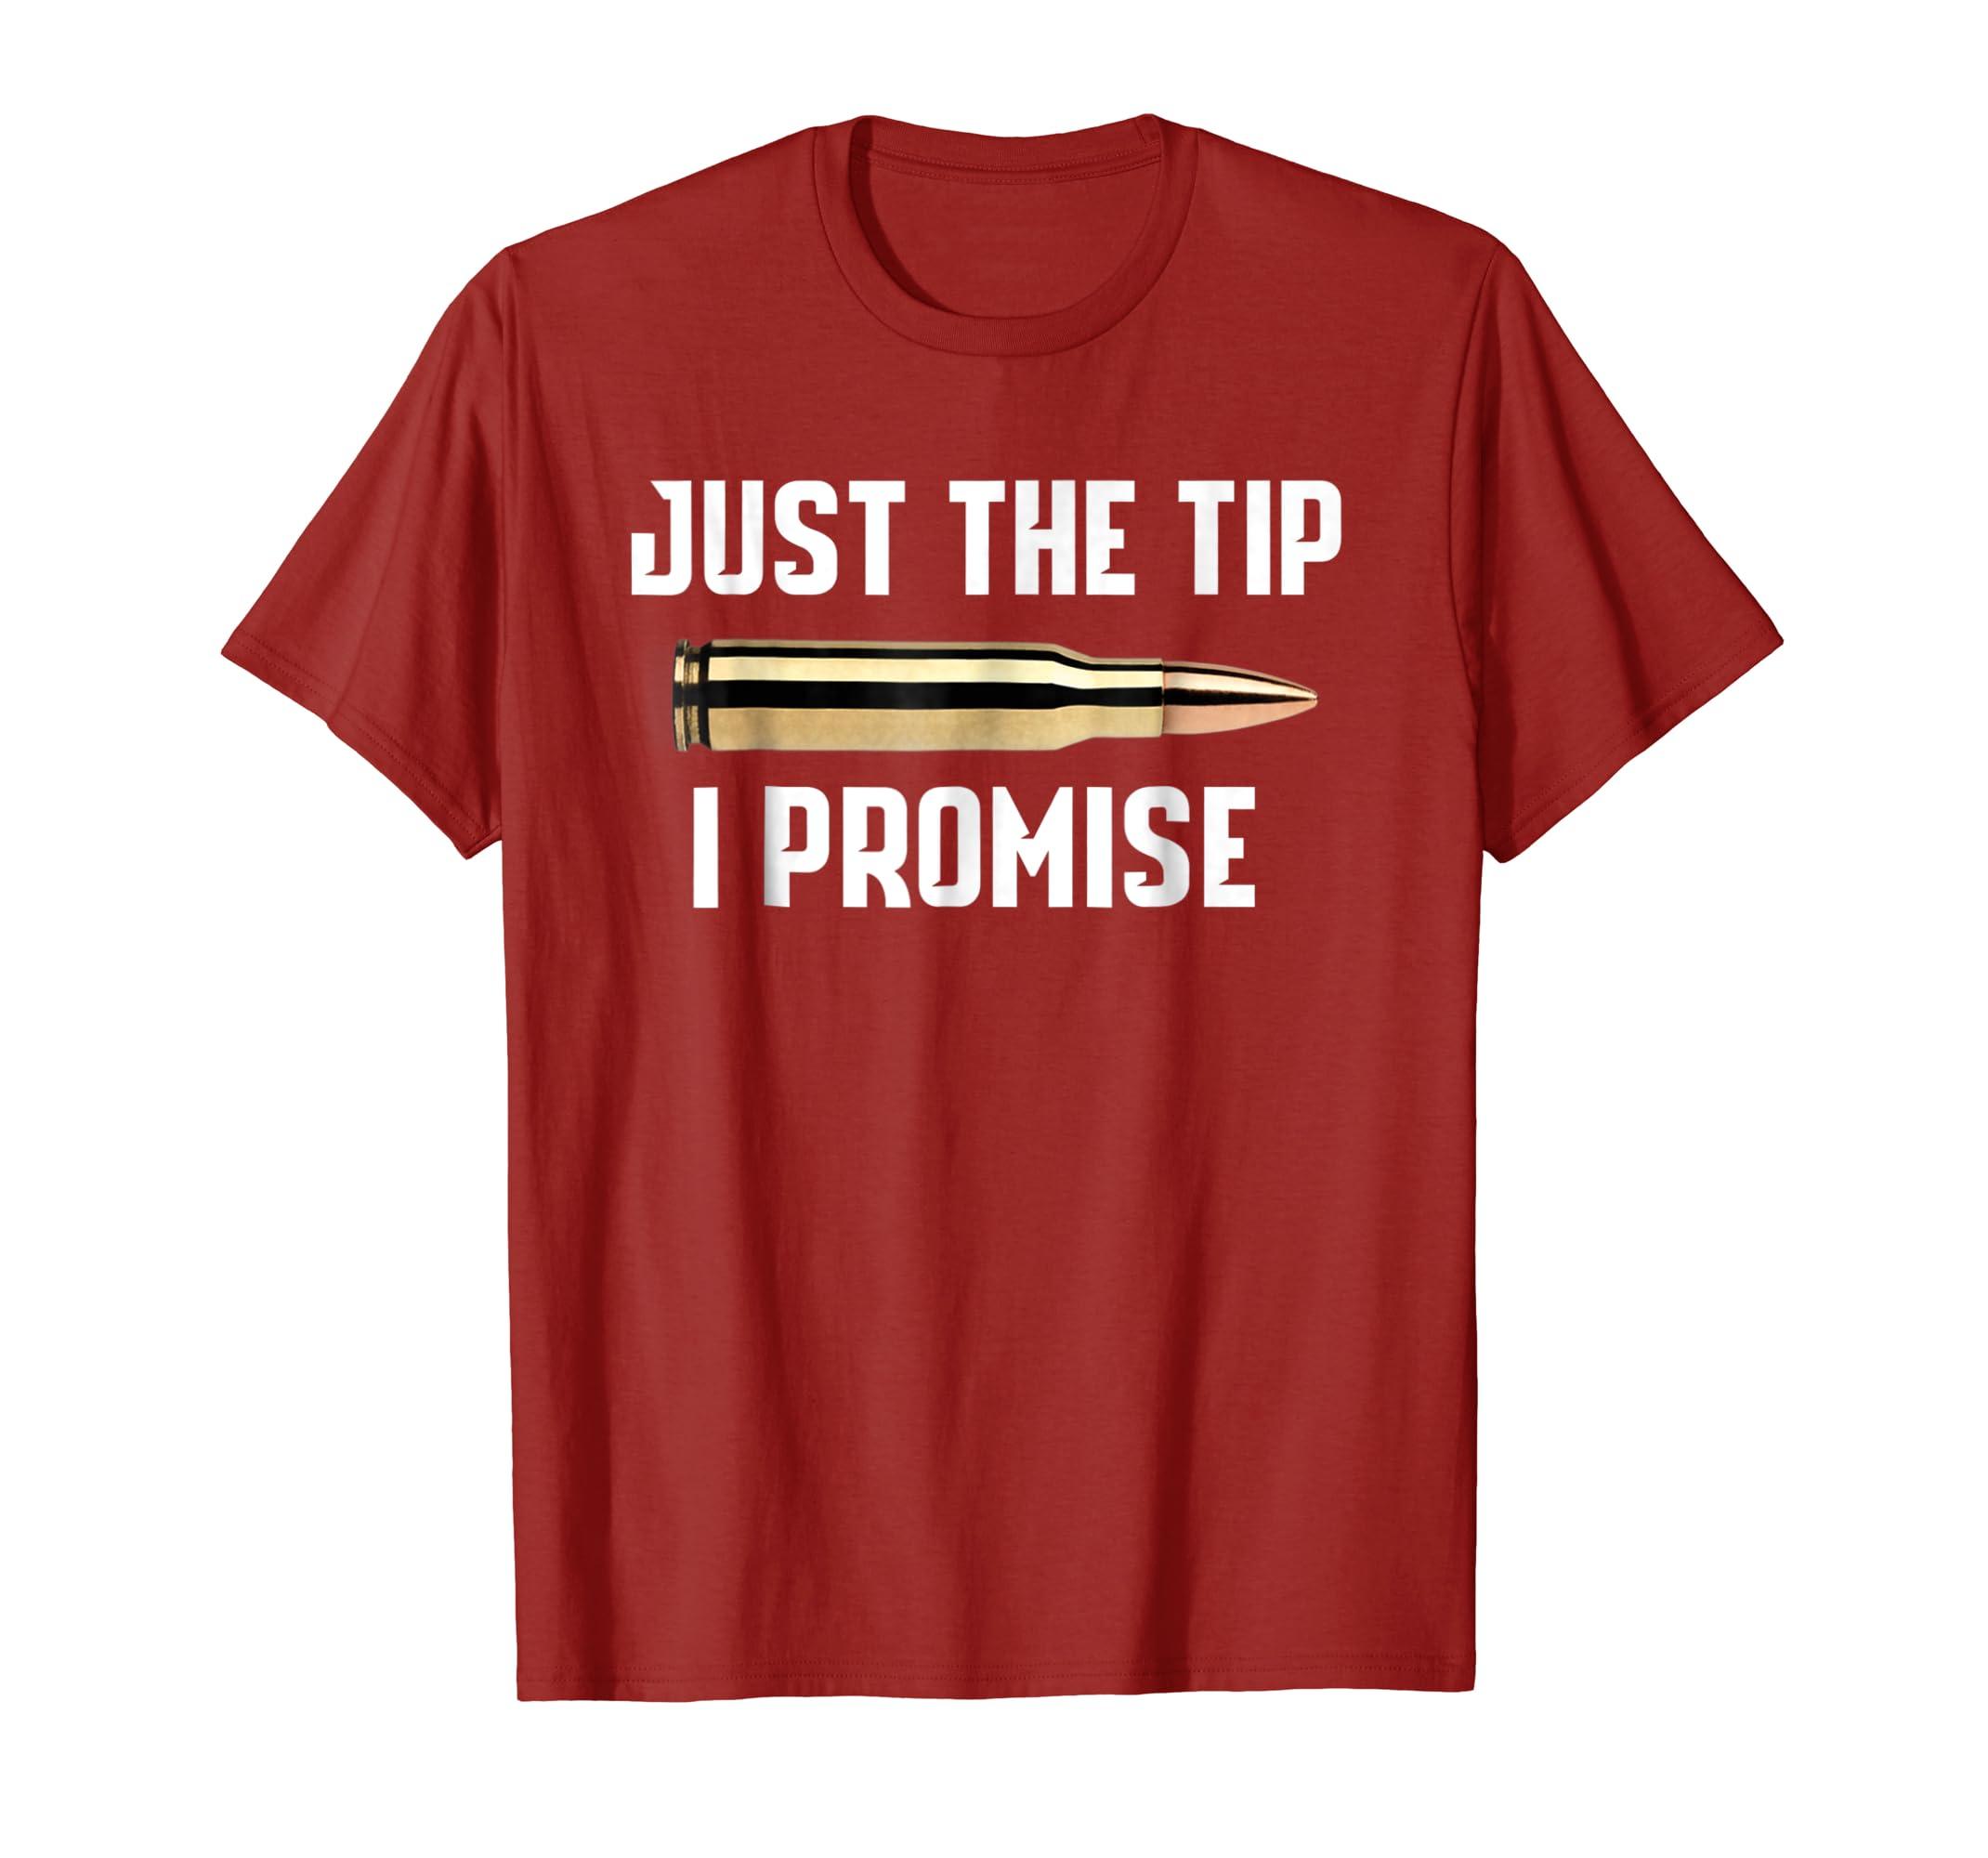 39184a57bed Just The Tip I Promise Shirt Funny Gun T Shirt-Teechatpro ...